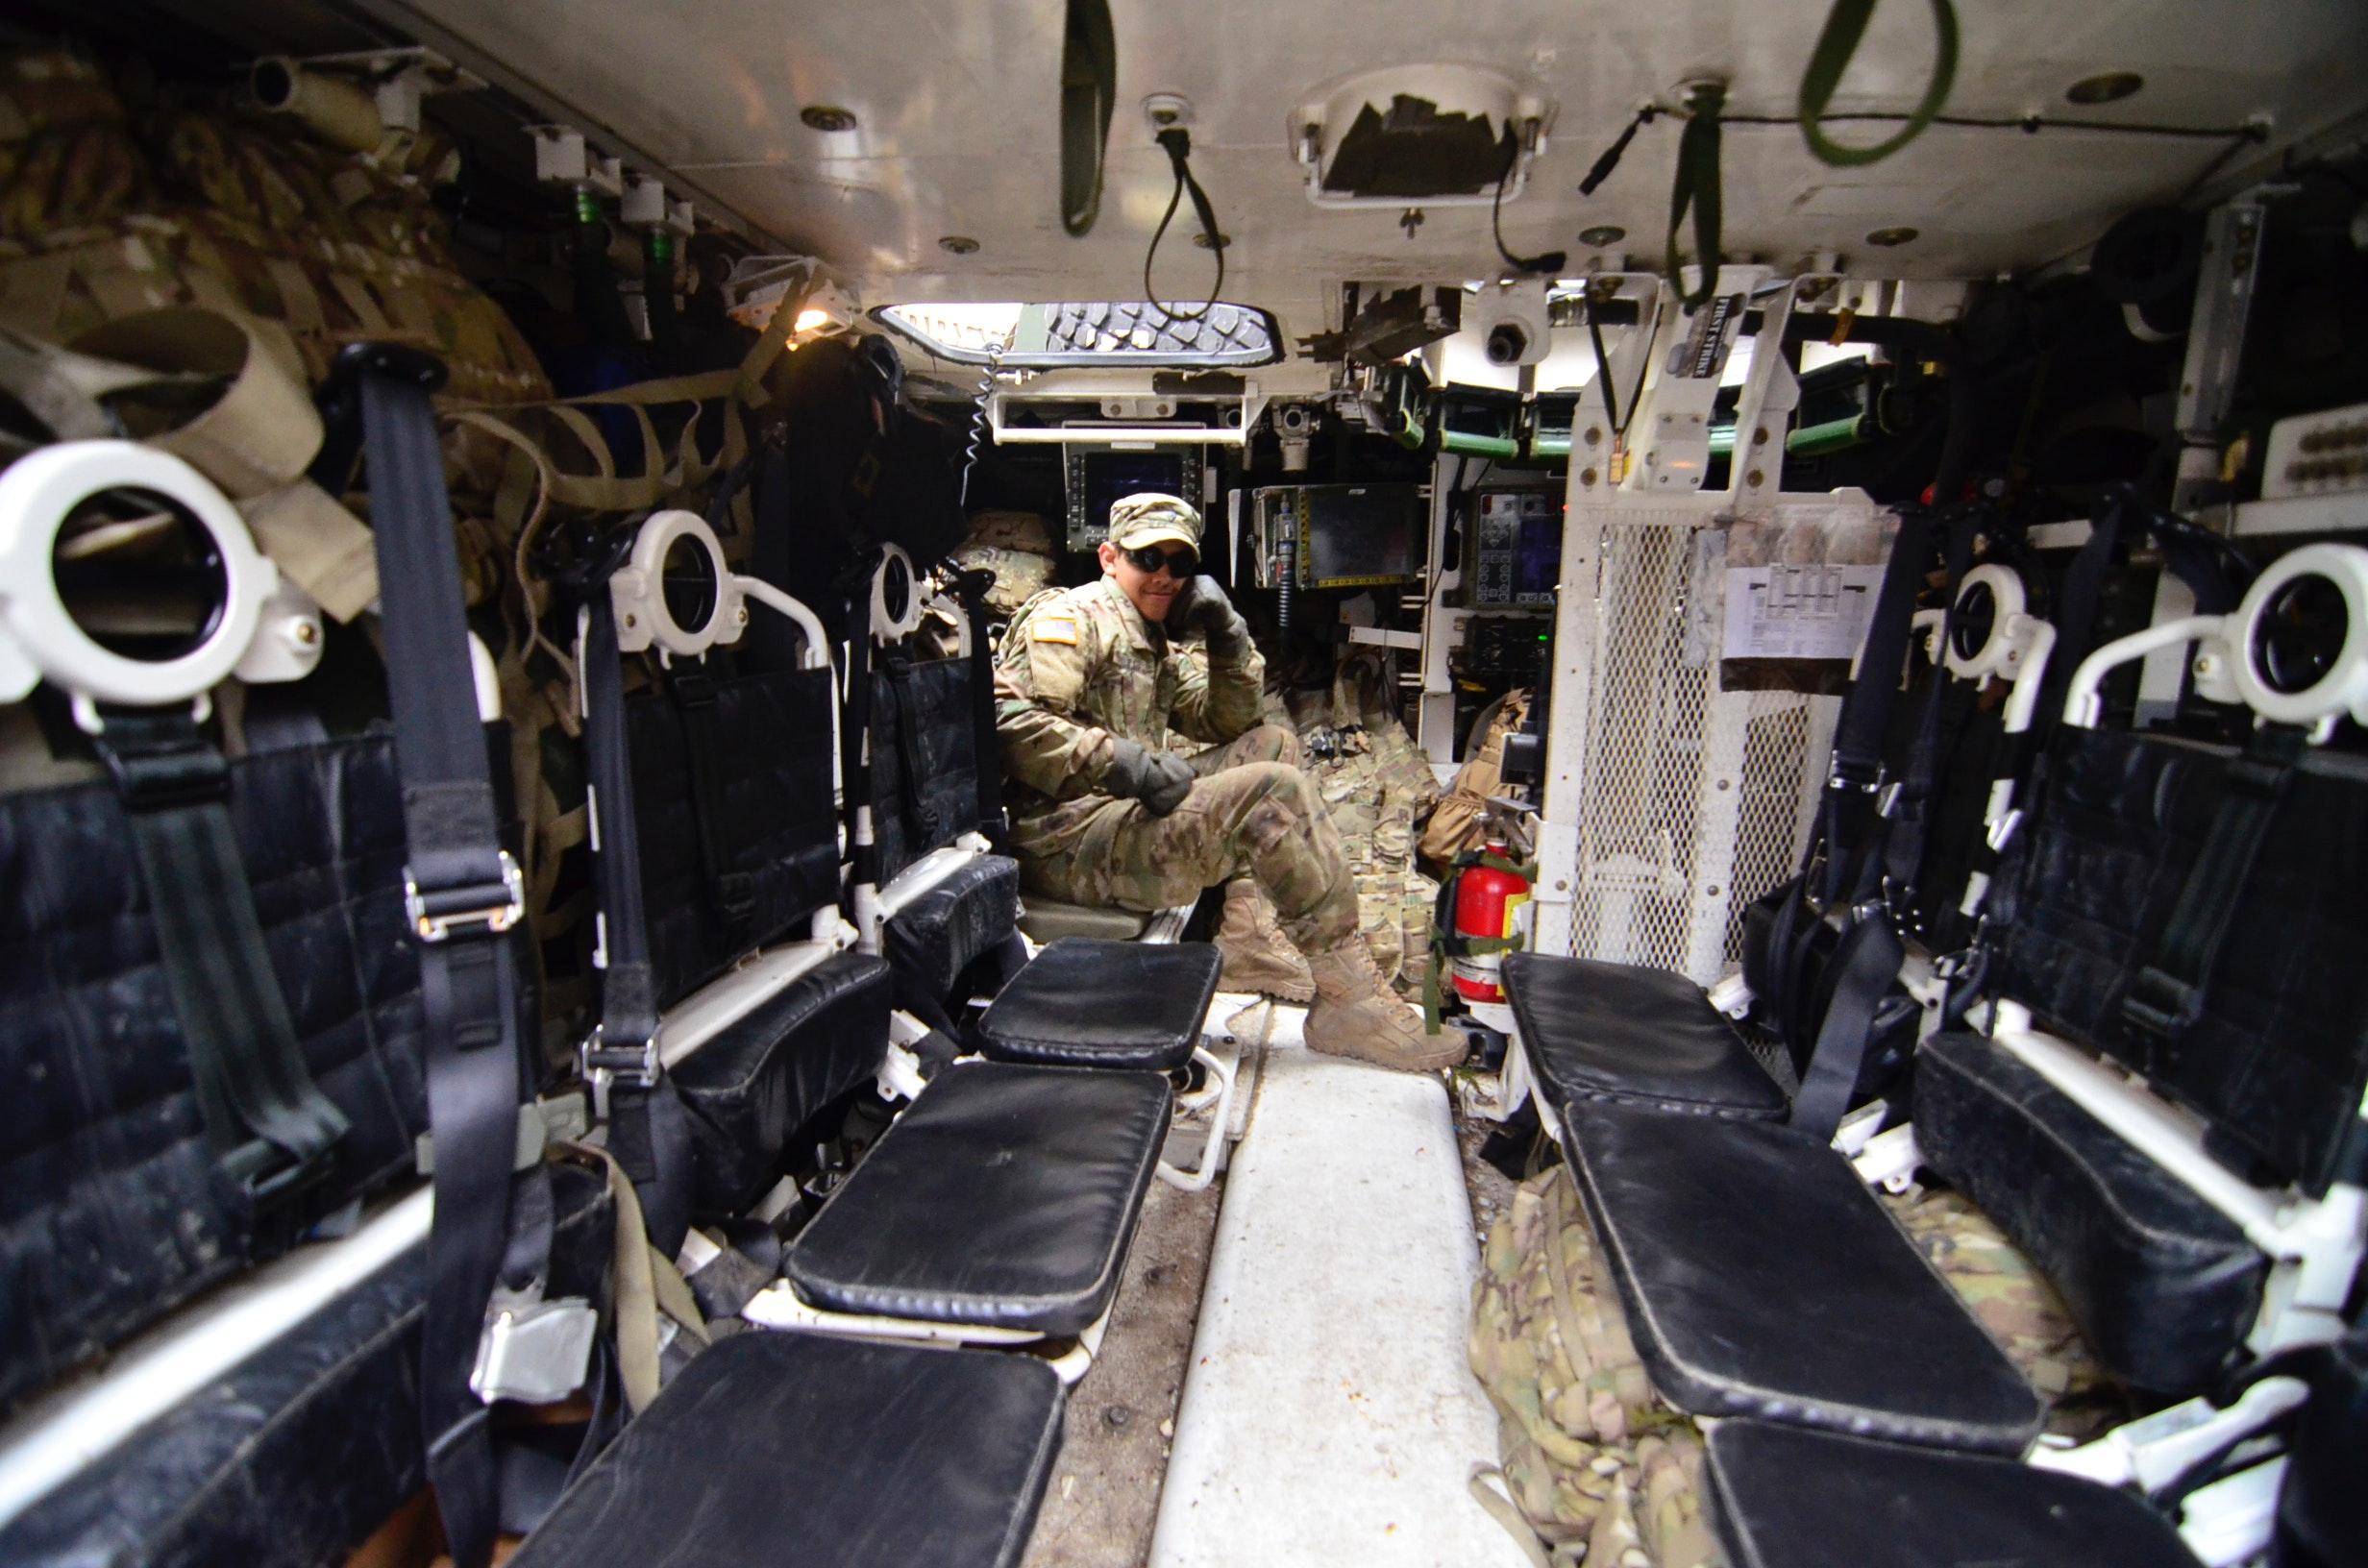 Collin Aerospace To Provide PRC-162 Radios For The U.S. Army